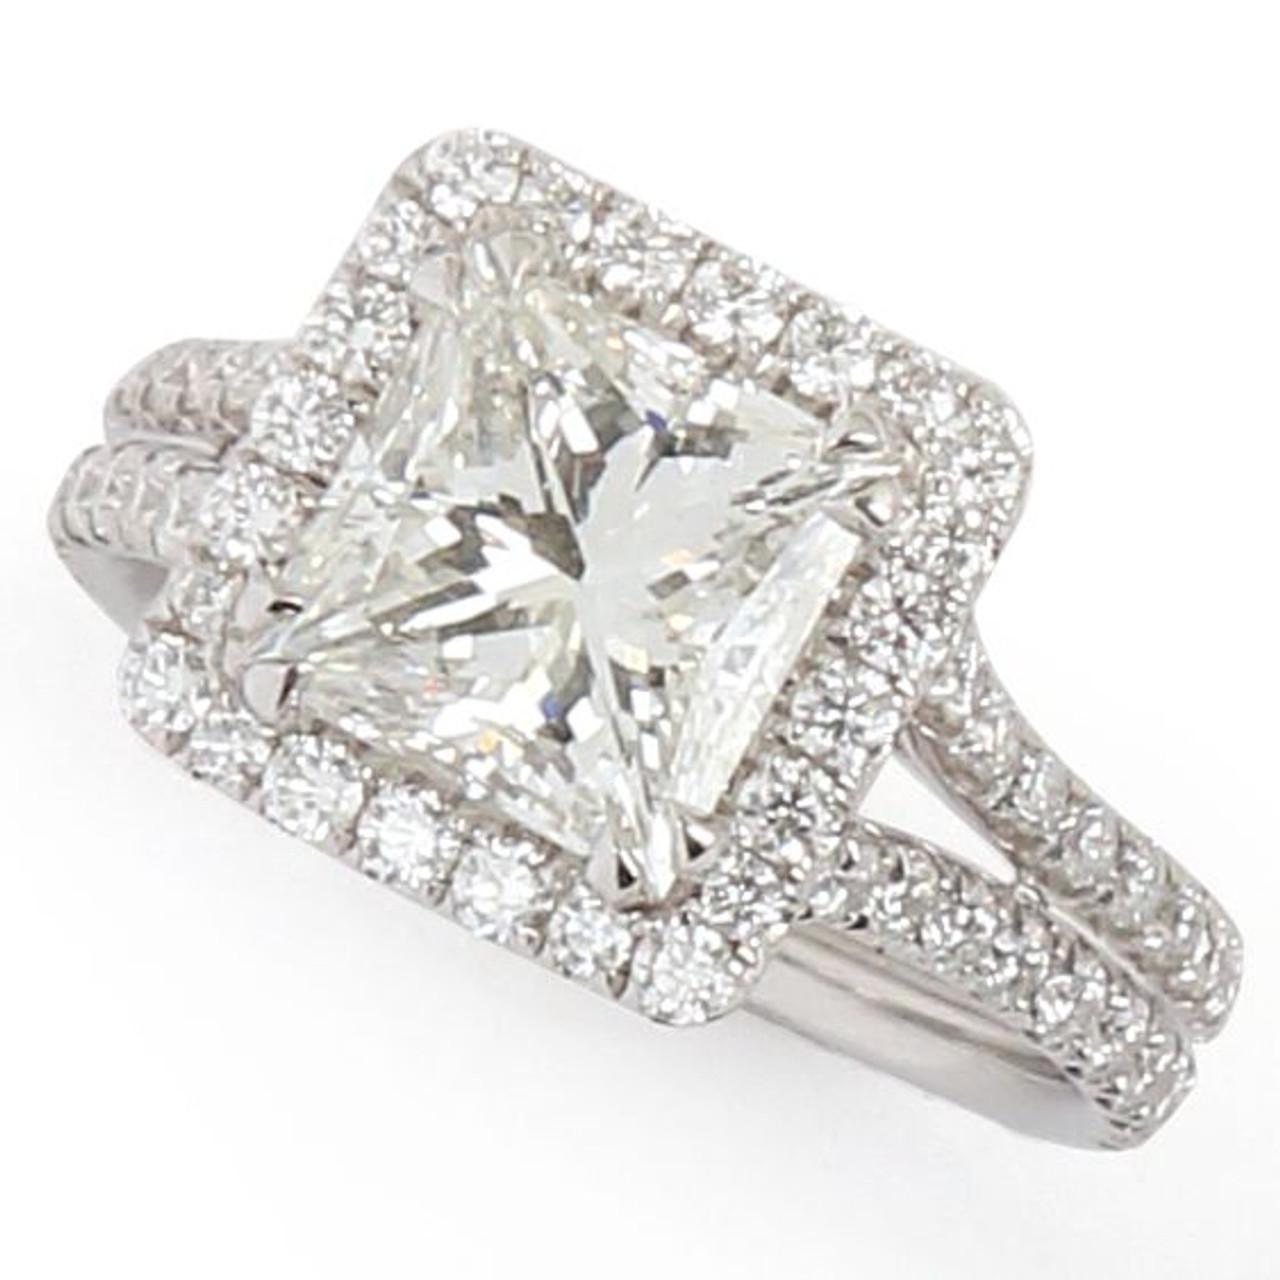 2 24ct Princess Cut Halo Diamond Ring Gale Diamonds Chicago